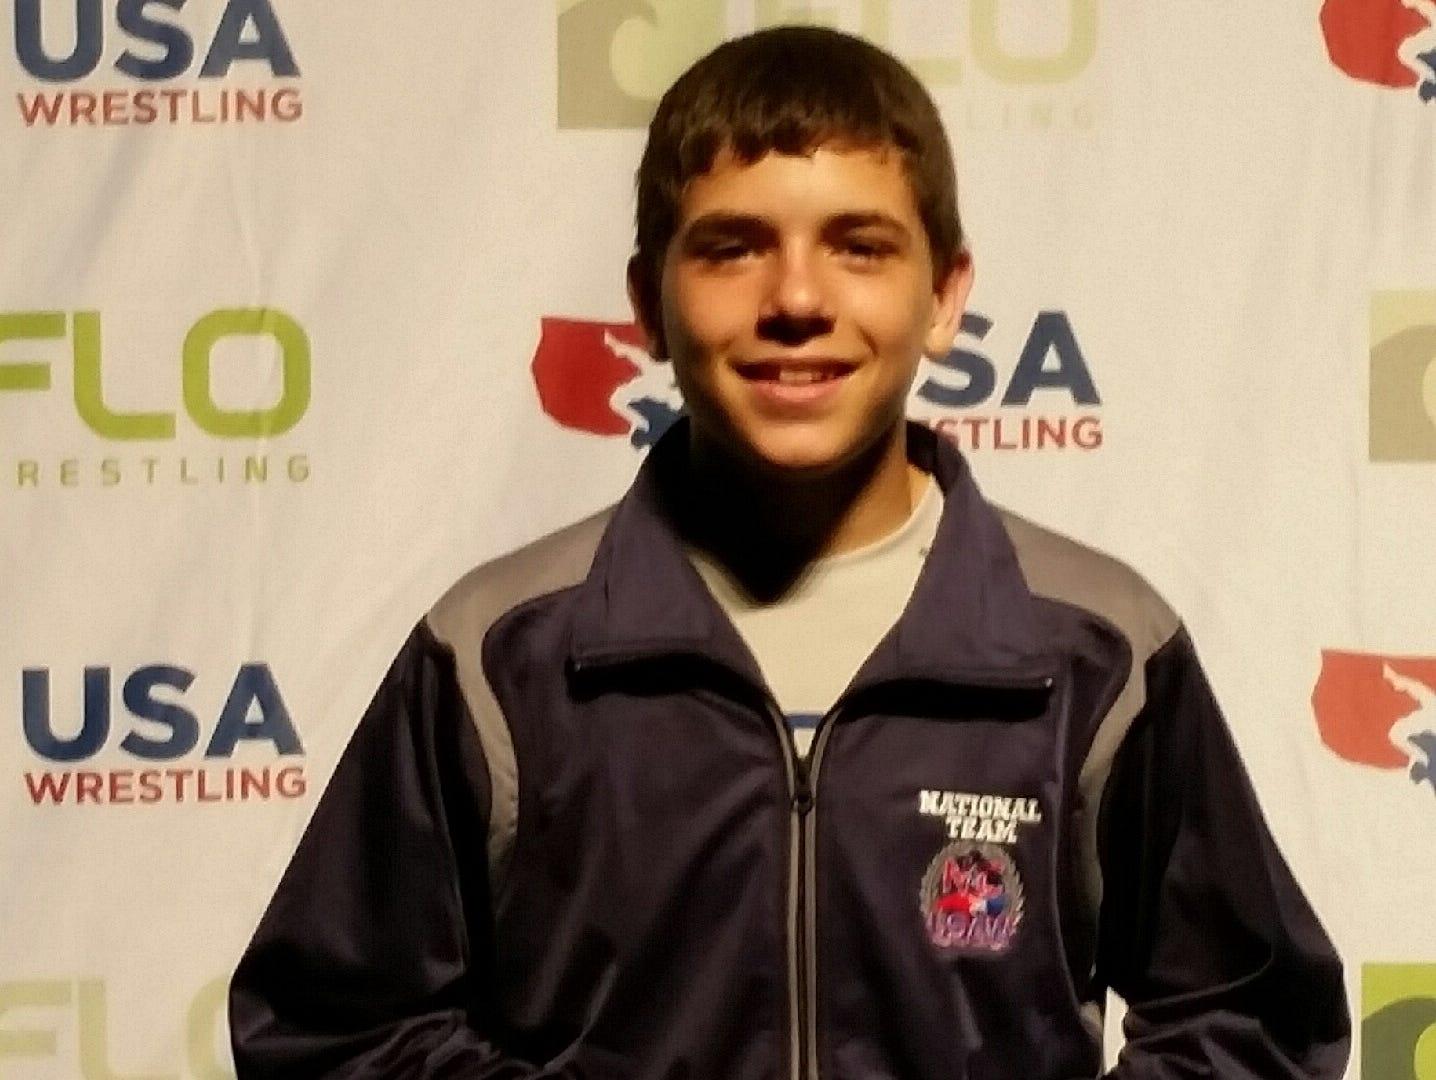 North Henderson rising freshman Josh Blatt placed seventh in the USA Wrestling Cadet Nationals Greco-Roman tournament in Fargo, N.D.